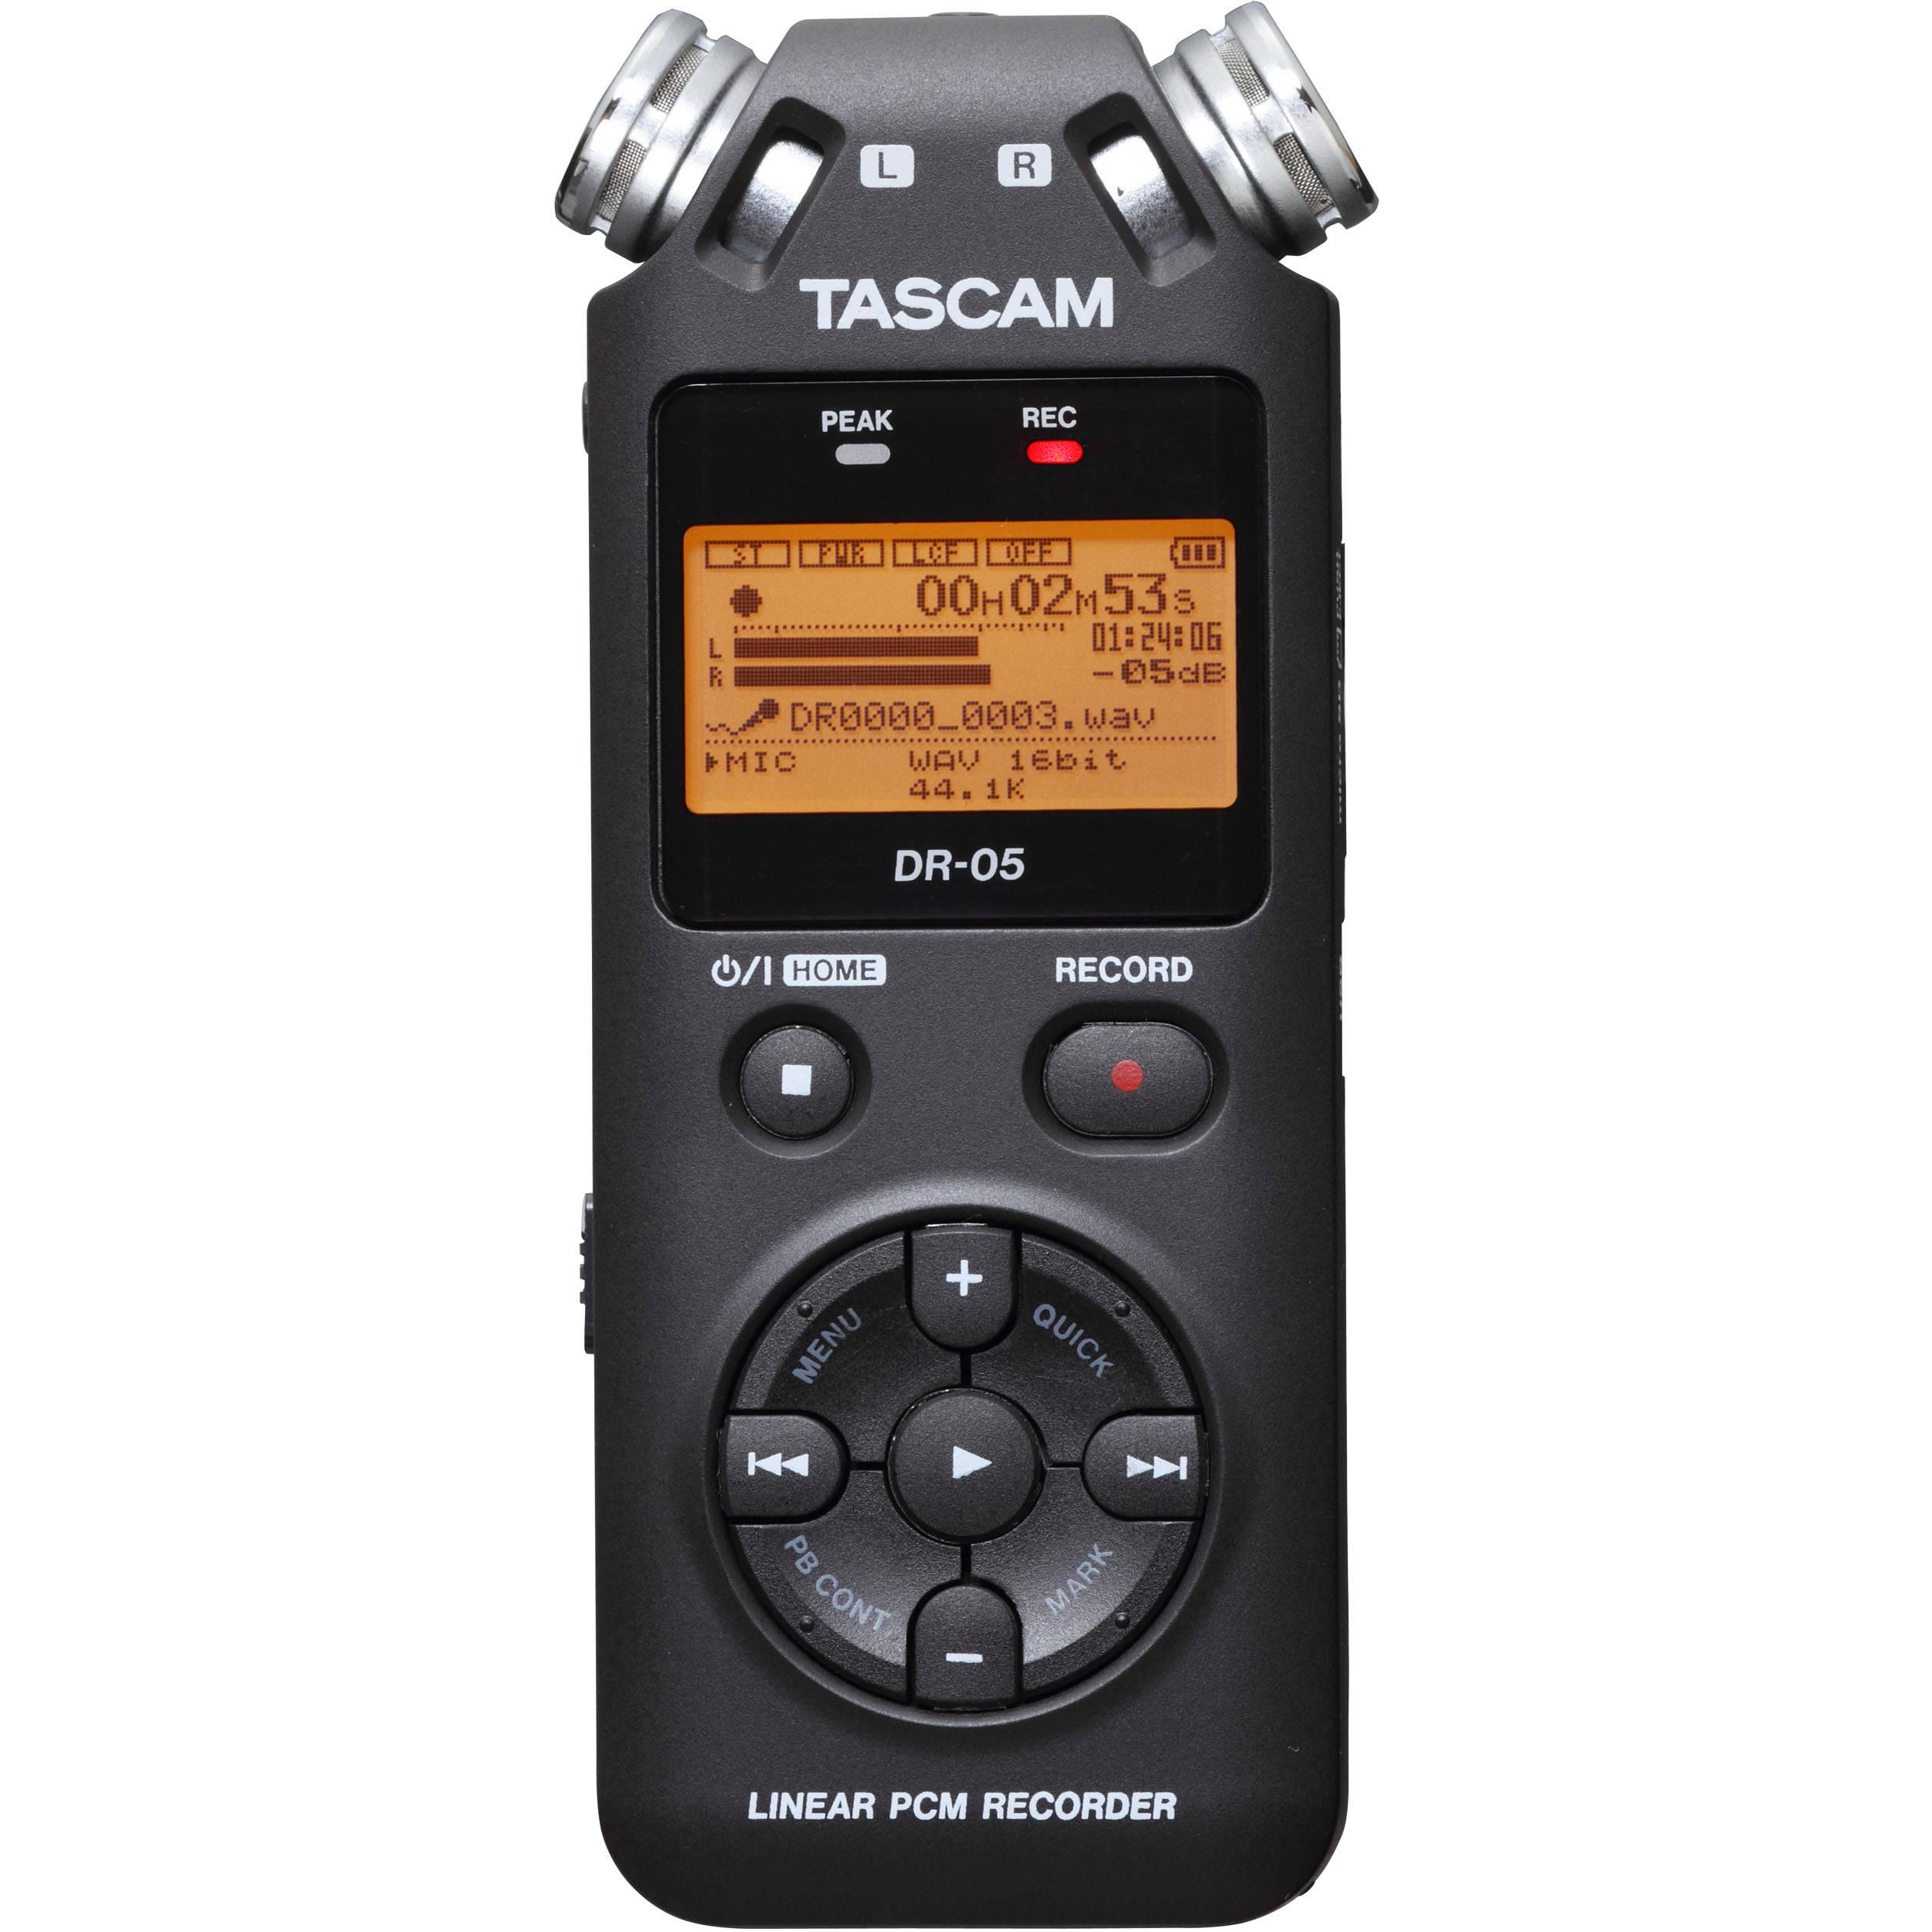 Tascam DR-05 Portable Handheld